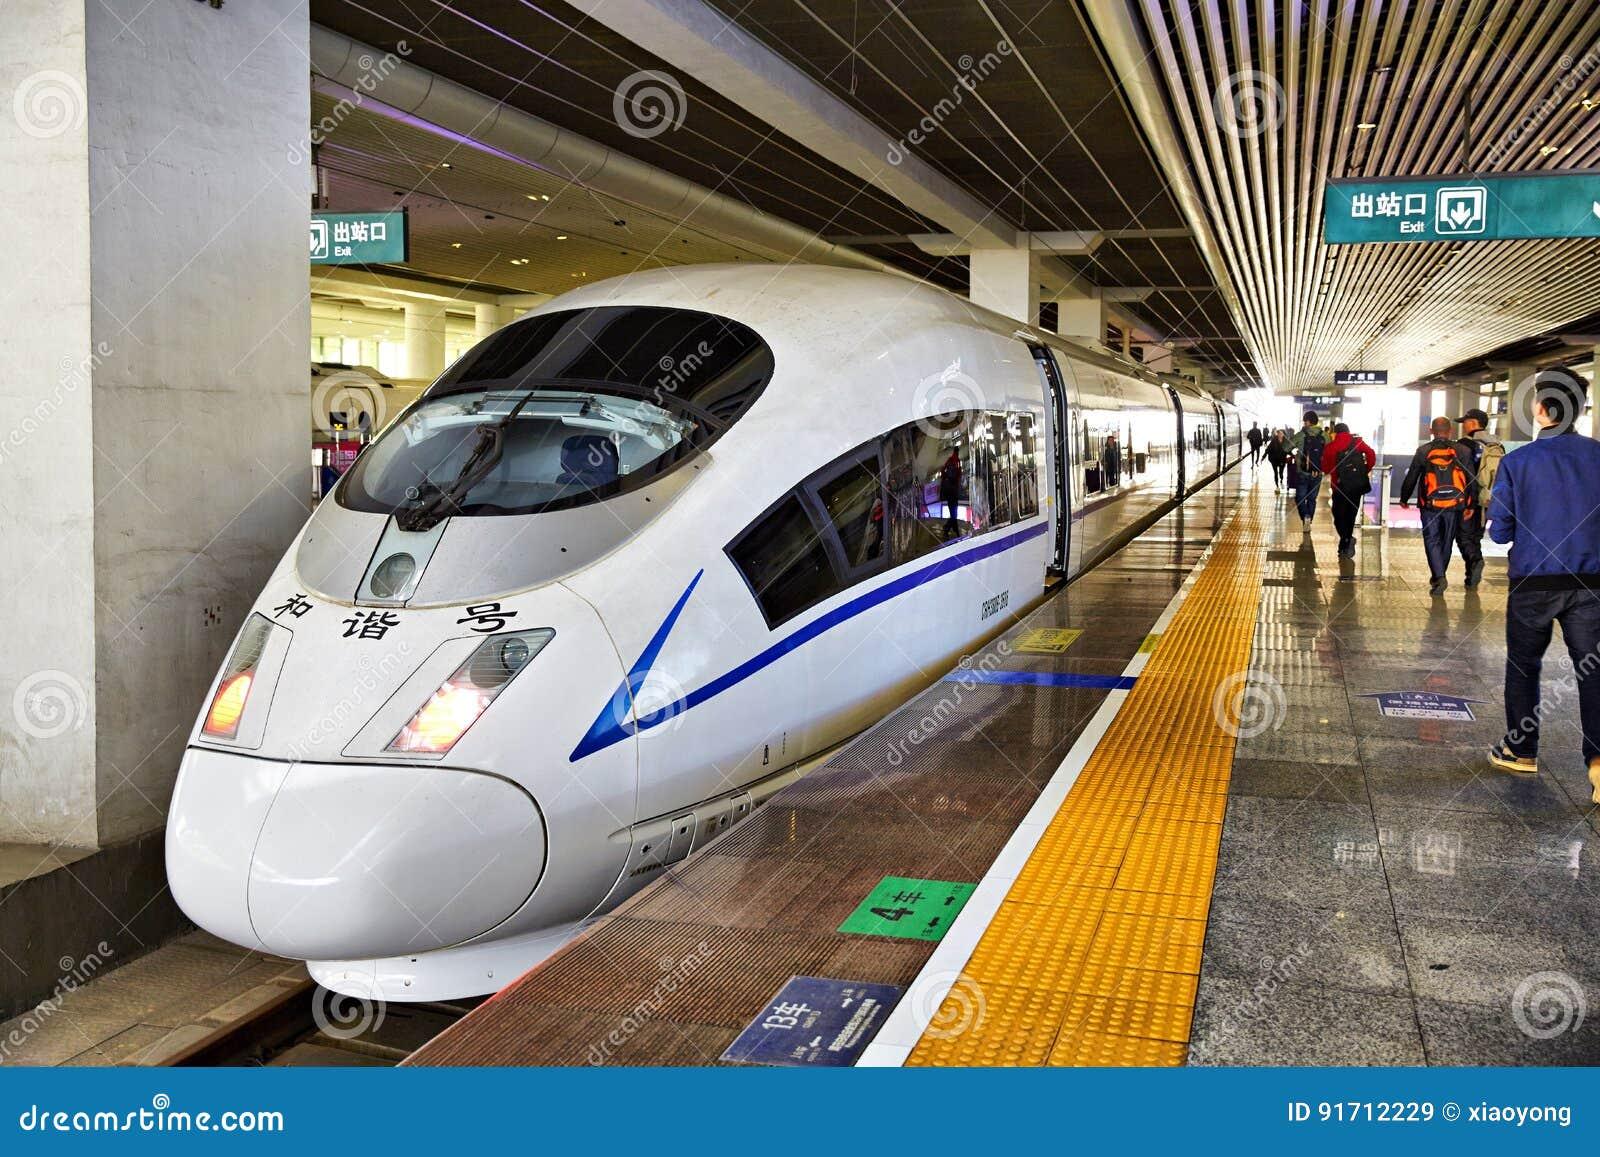 China high speed train in platform